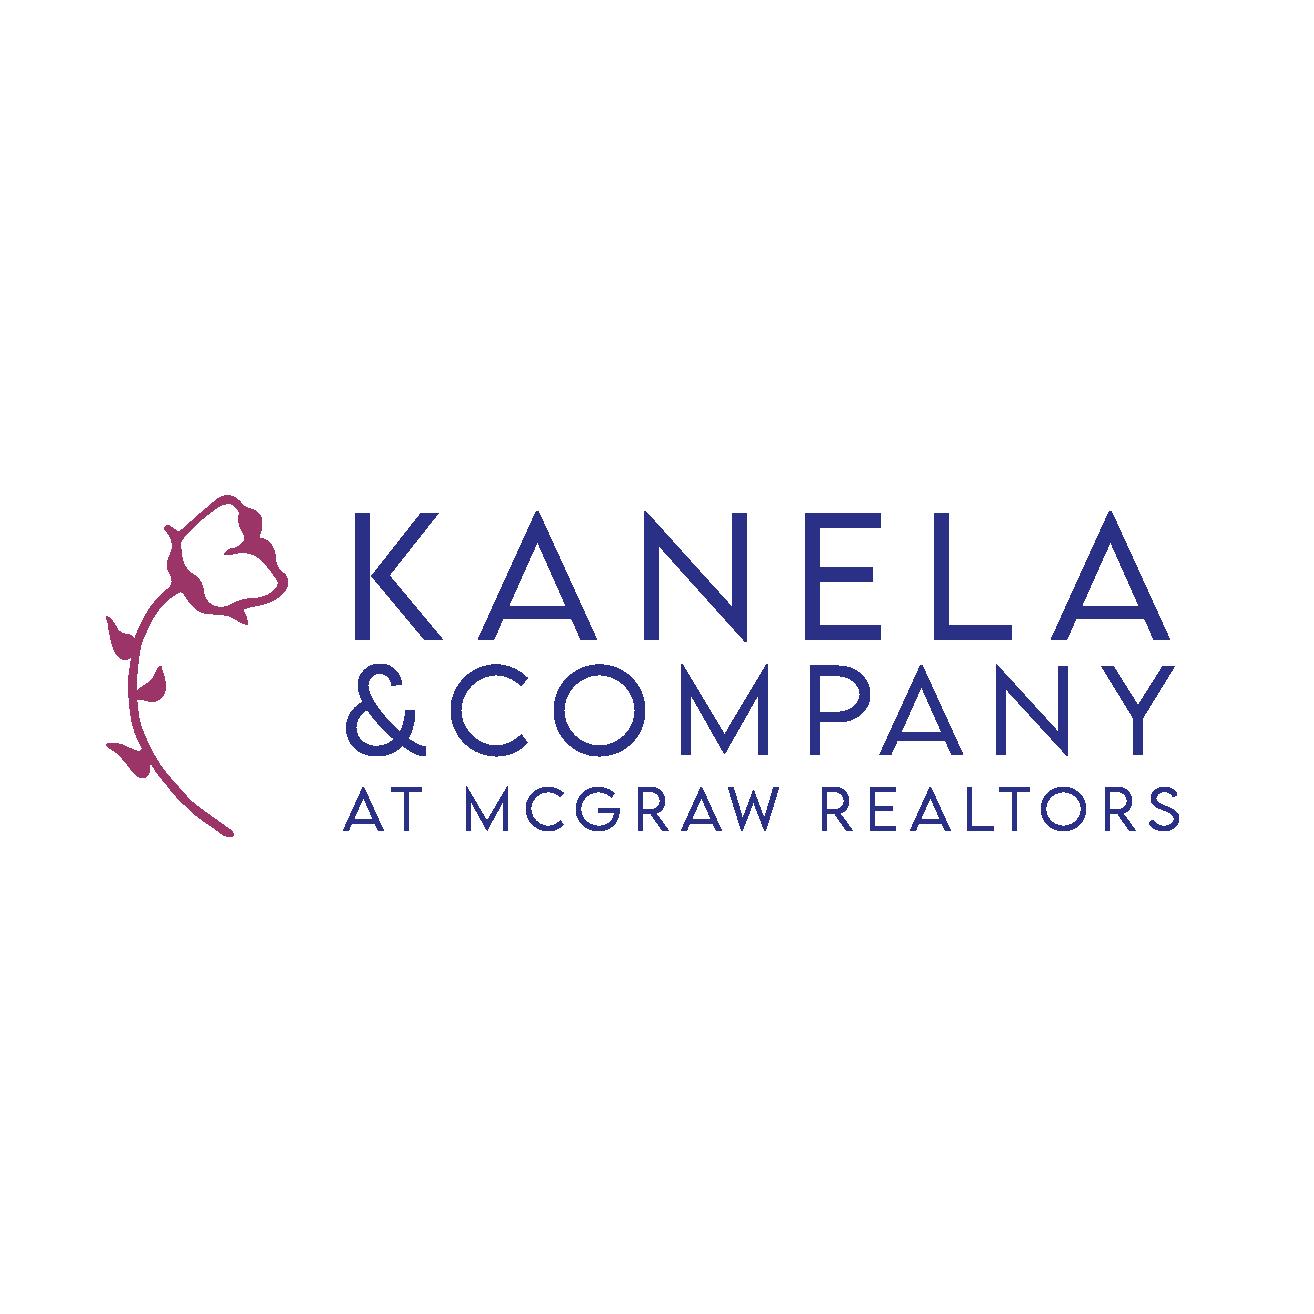 Kanela & Company